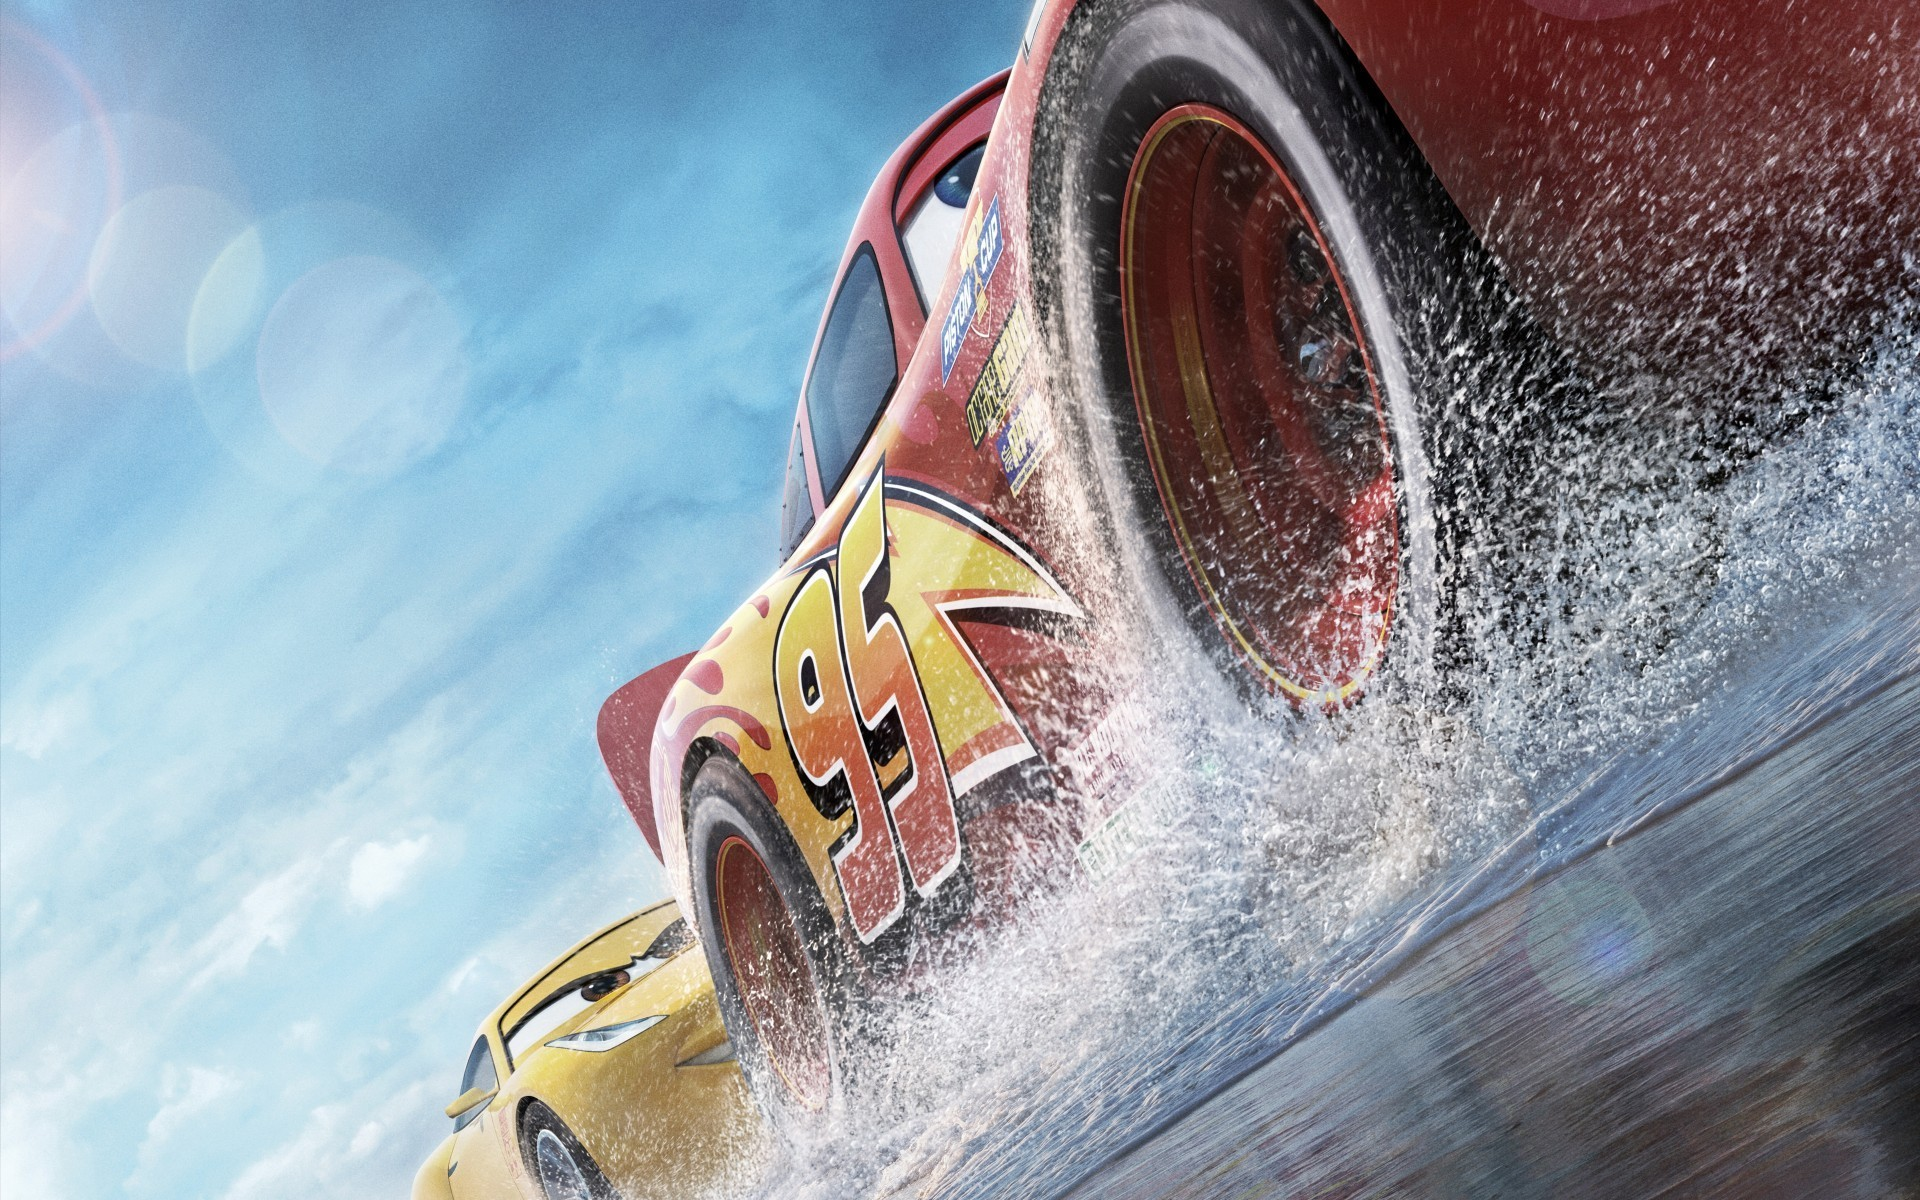 Res: 1920x1200, Cars 3, Animation, Lightning Mcqueen, Pixar